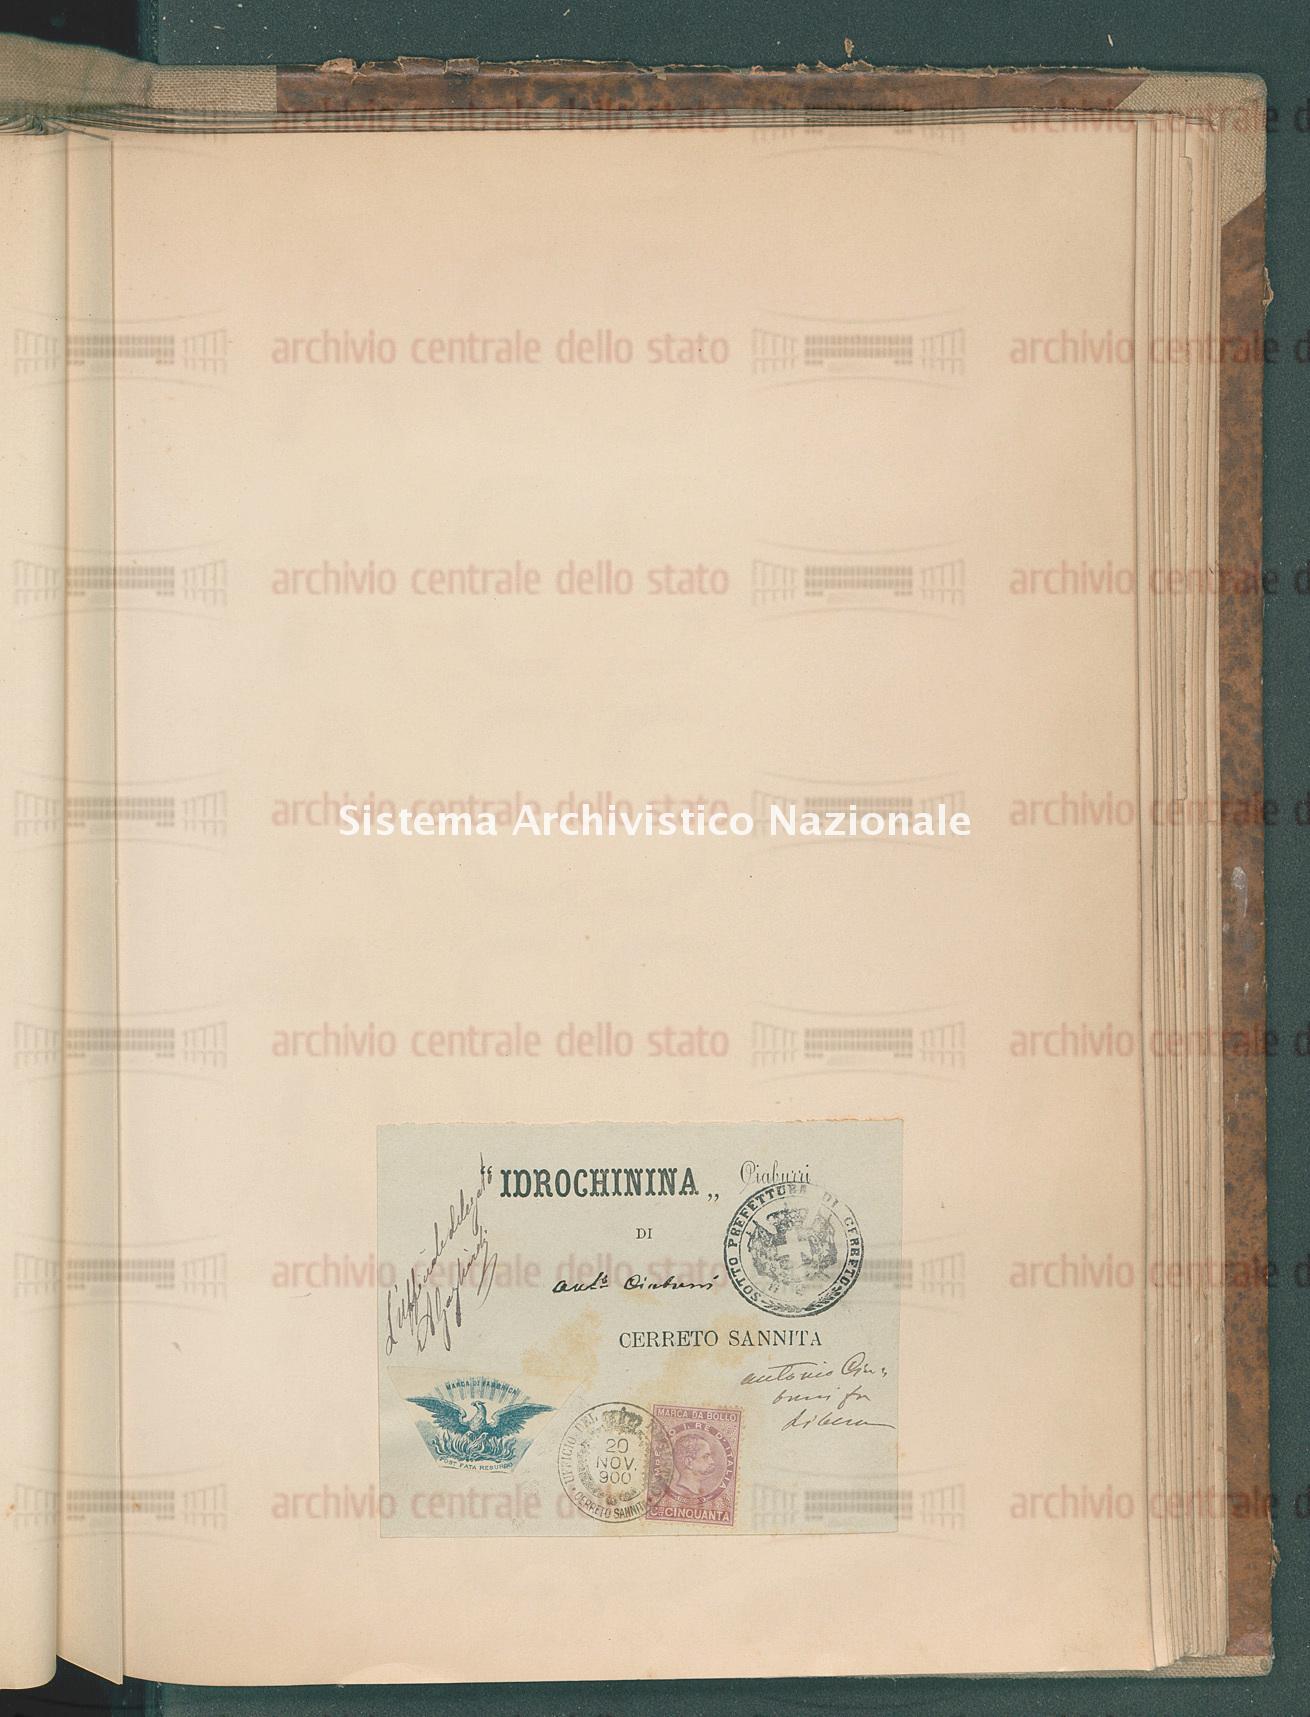 Ciaburri Antonio (16/12/1900)